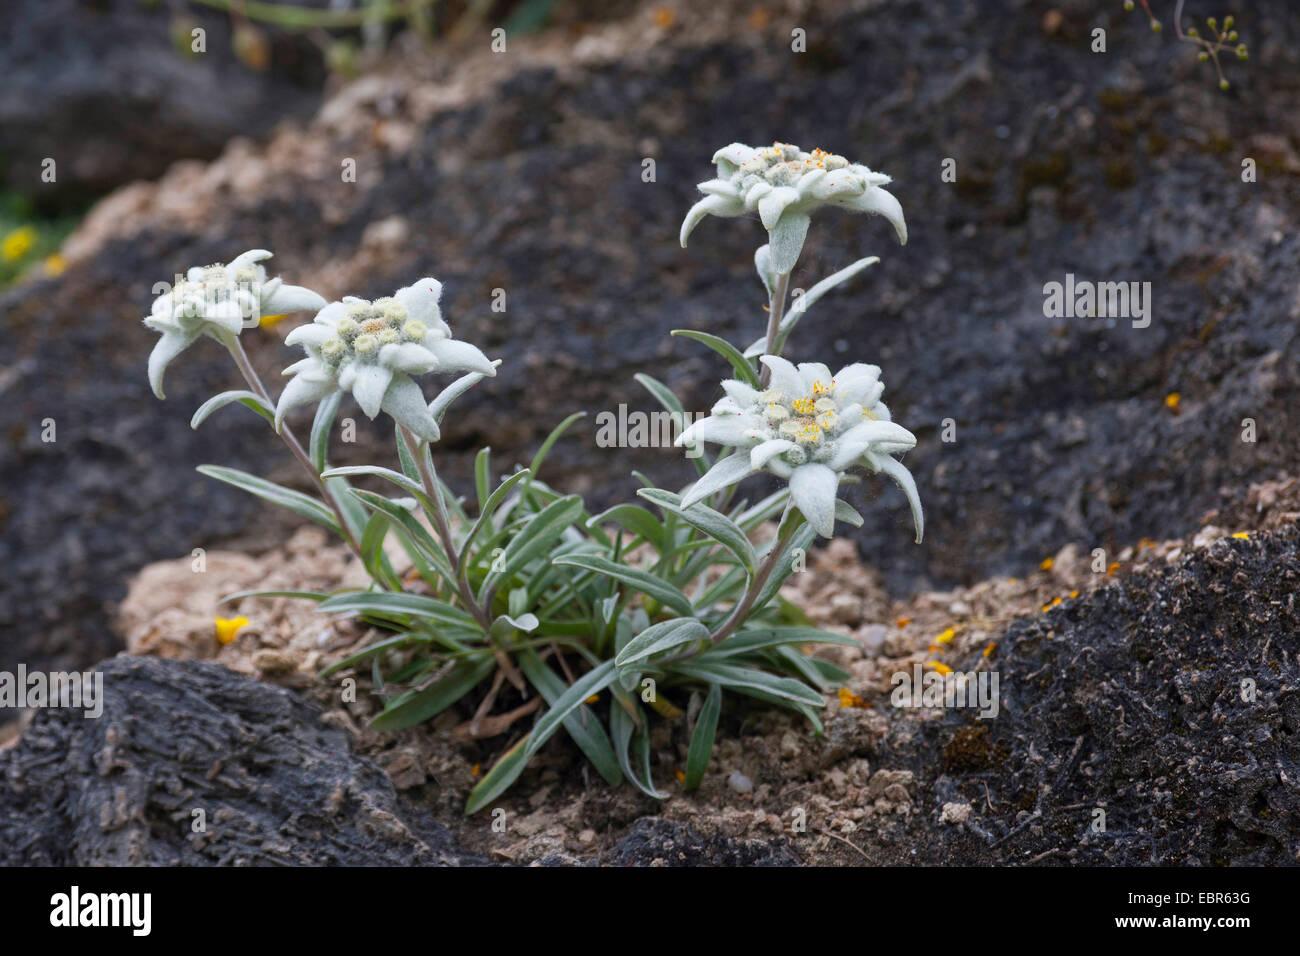 edelwei leontopodium alpinum leontopodium nivale. Black Bedroom Furniture Sets. Home Design Ideas